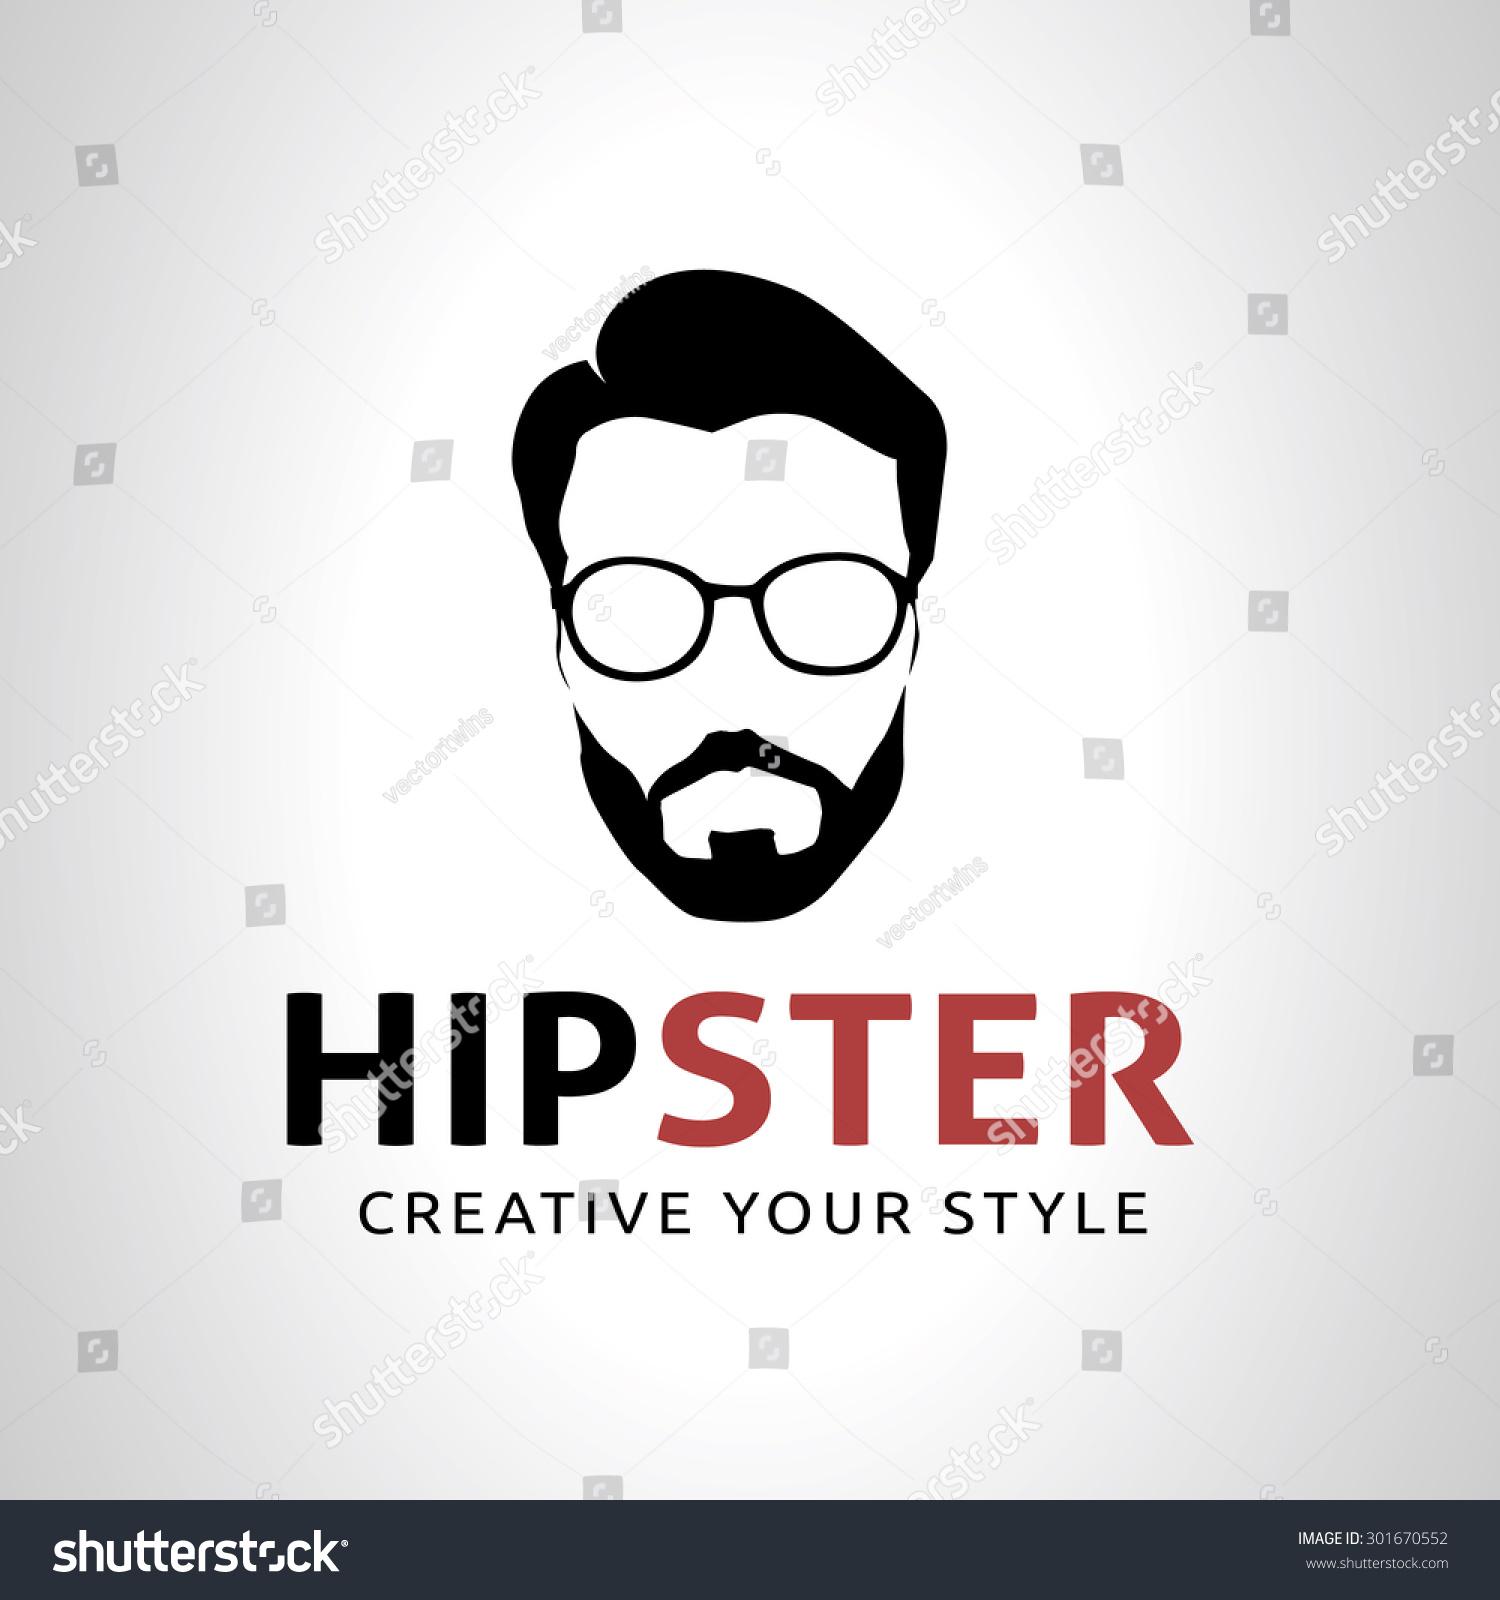 Hipster Logogeek Logoman Old School Logo Stock Vector ...